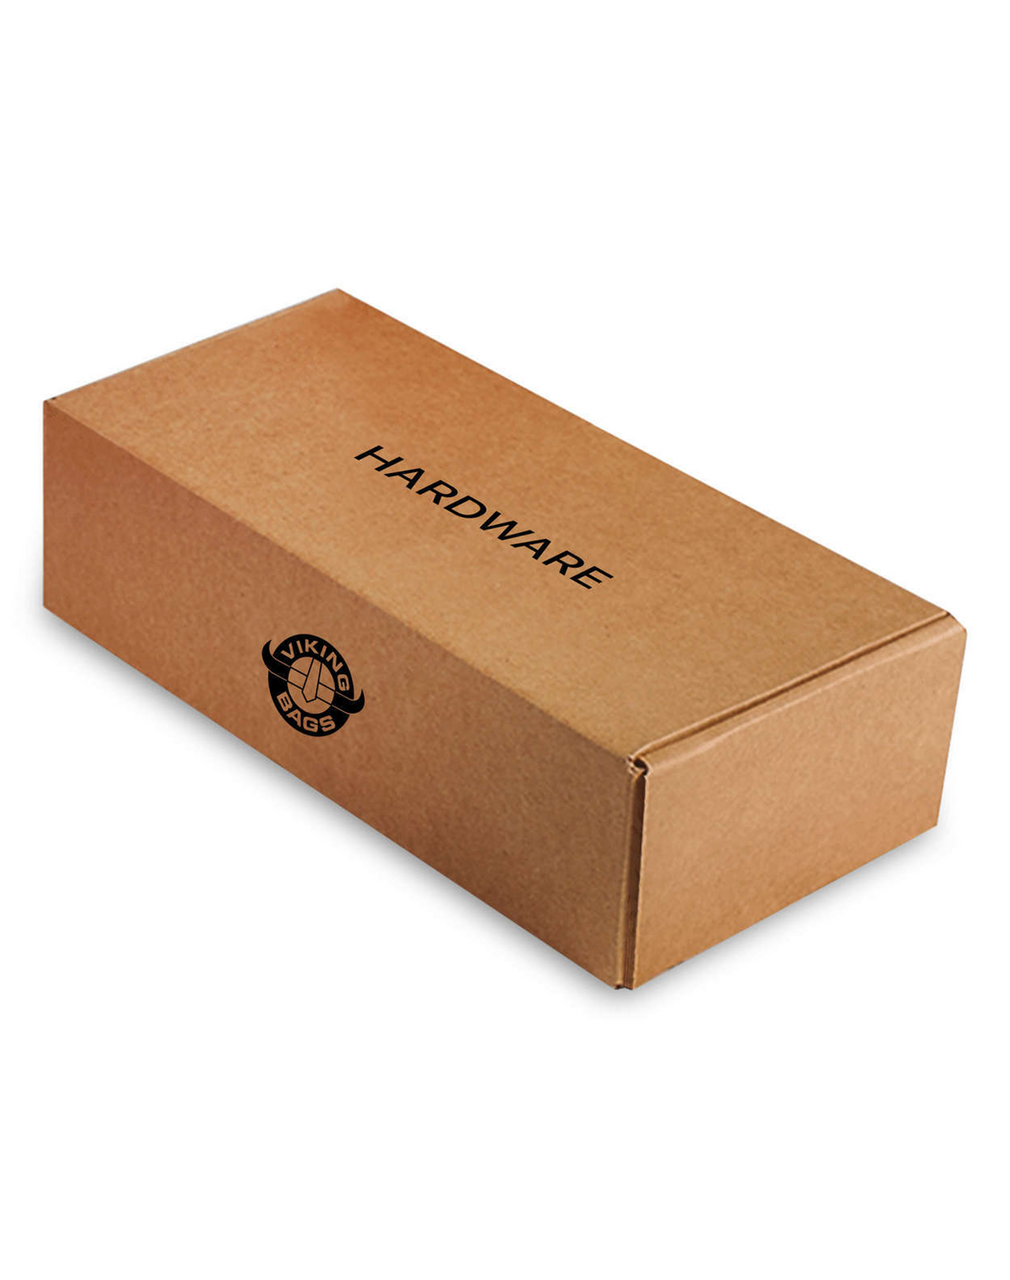 Honda VTX 1300 C Spear Shock Cutout Motorcycle Saddlebags Hardware Box